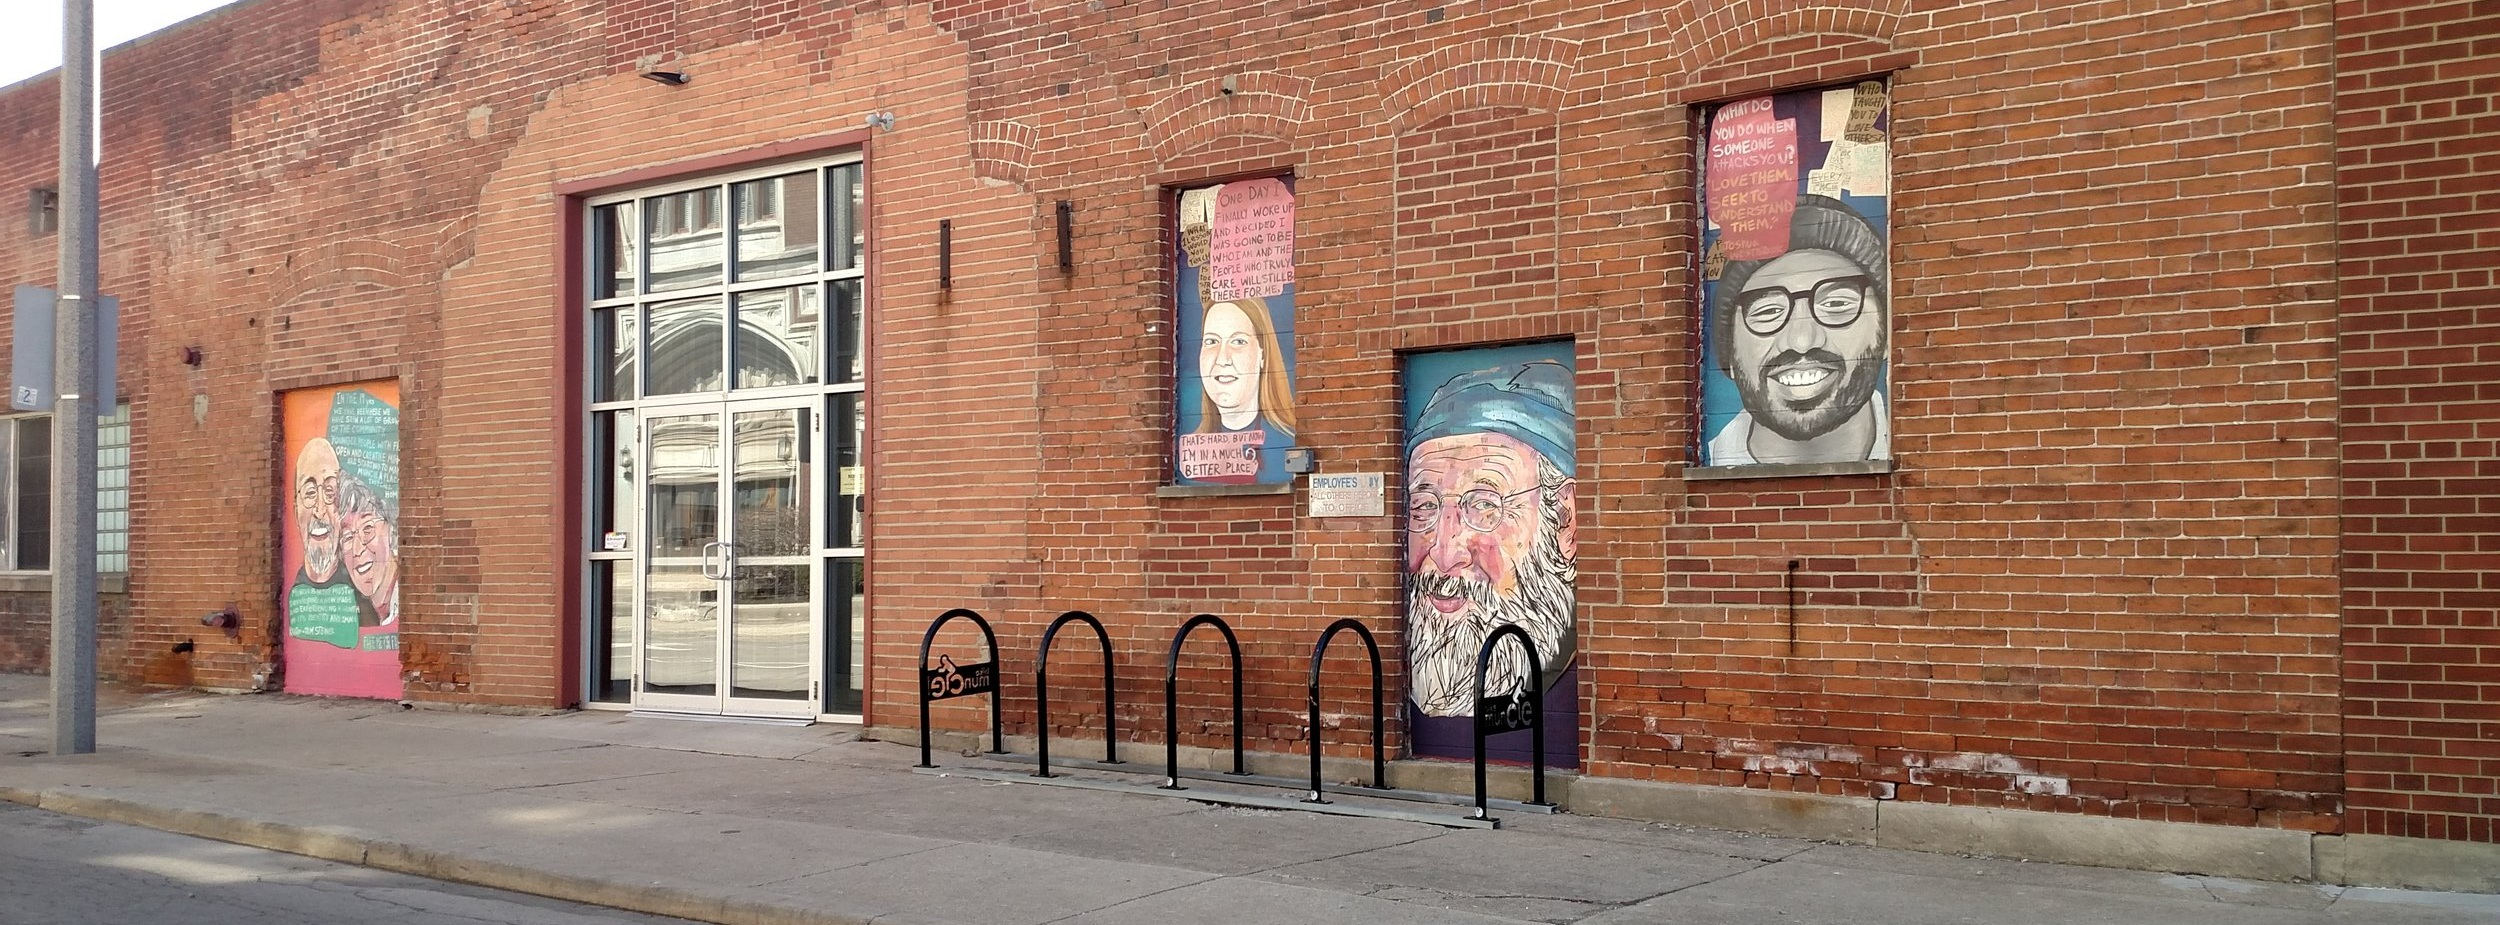 FaceMePorFavor Murals at Madjax (514 E. Jackson St.)